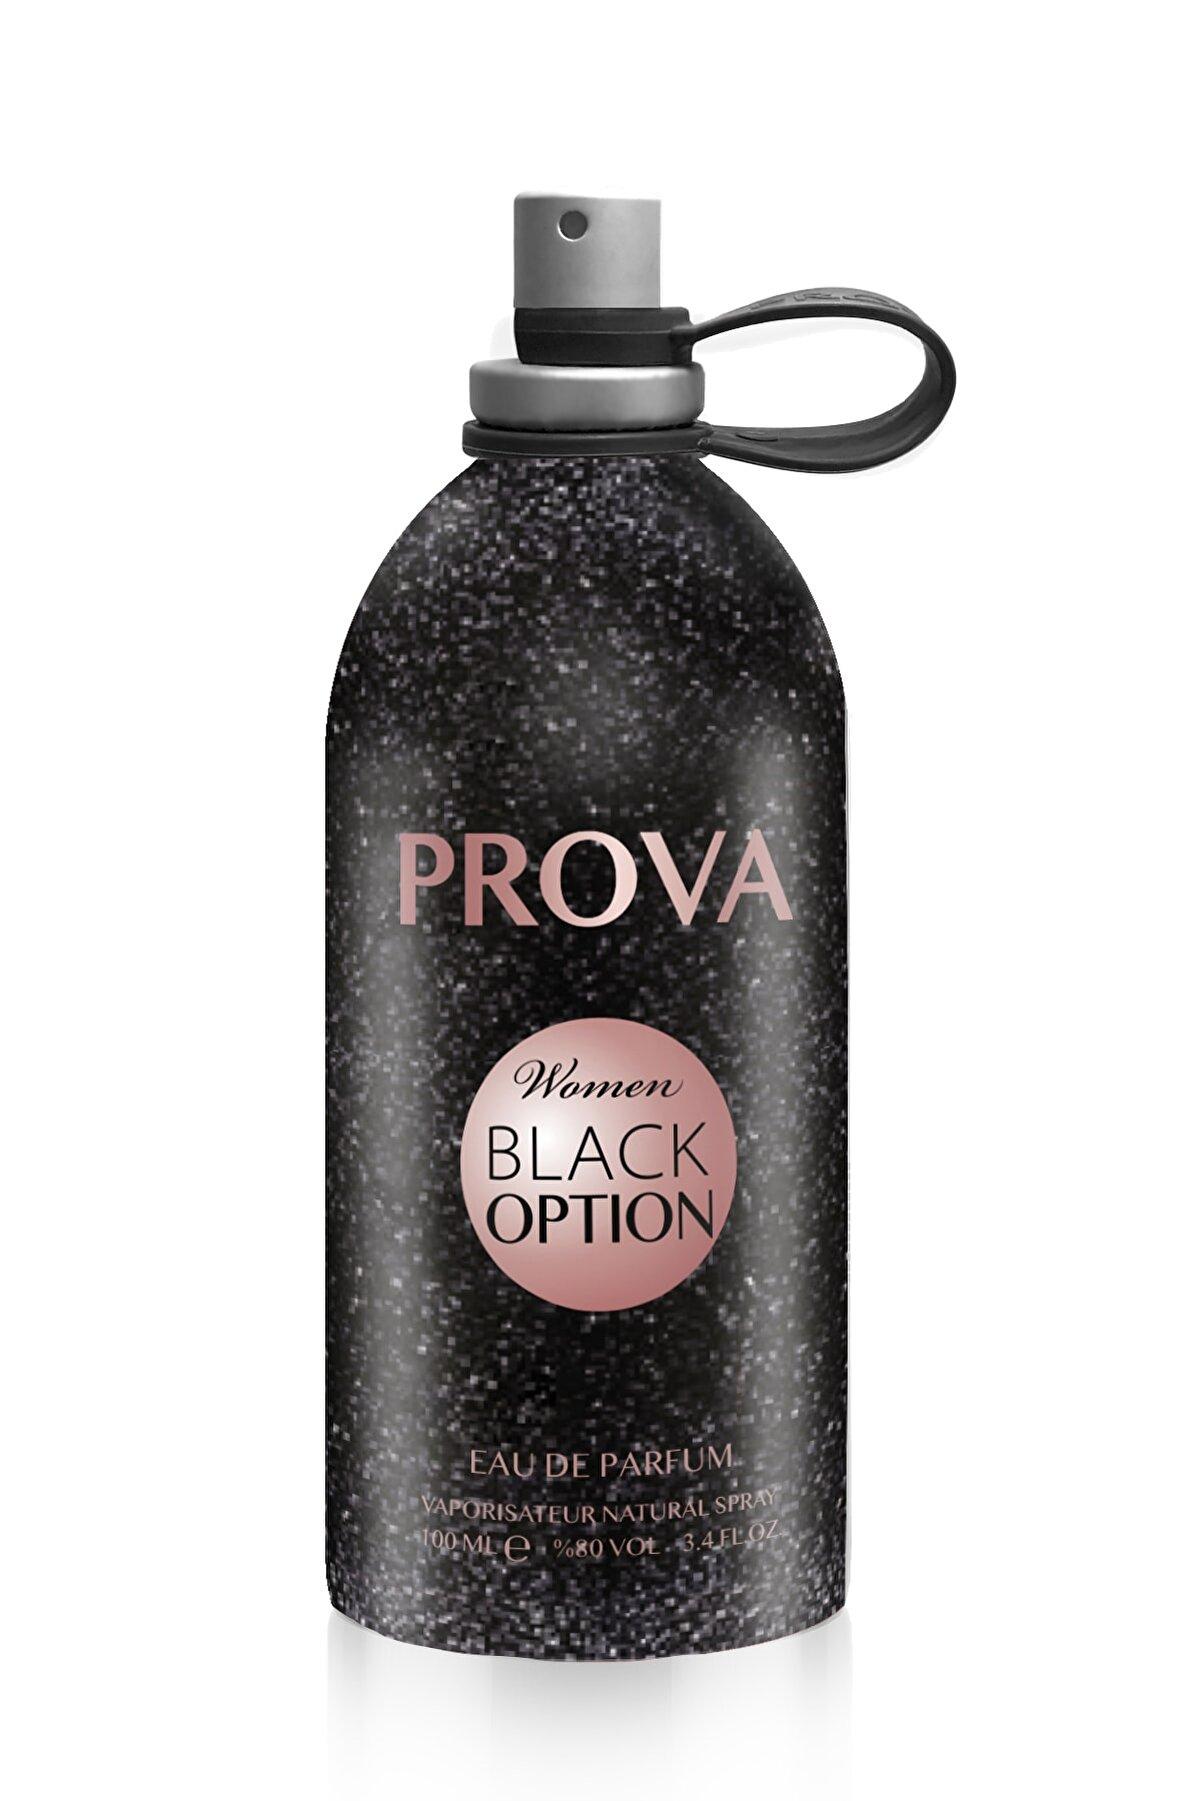 prova Black Option 100 Ml Kadın Parfümü